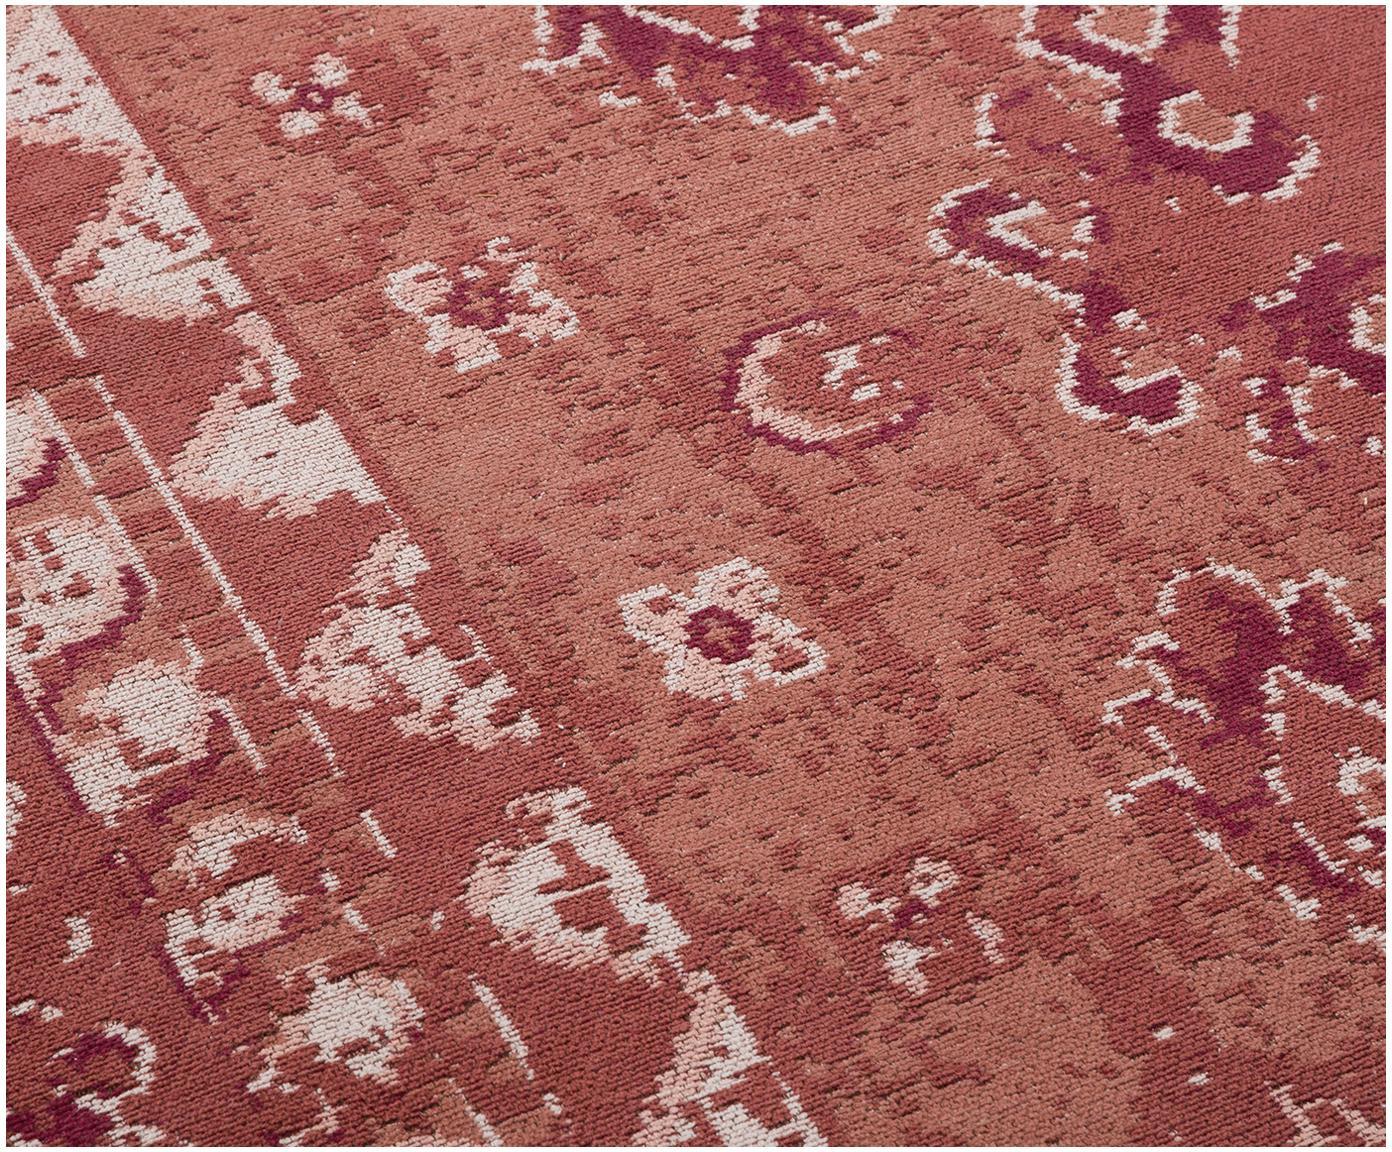 Vintage Chenilleteppich Rebel in Rot, Flor: 95% Baumwolle, 5% Polyest, Rostrot, Creme, Rot, B 120 x L 180 cm (Grösse S)